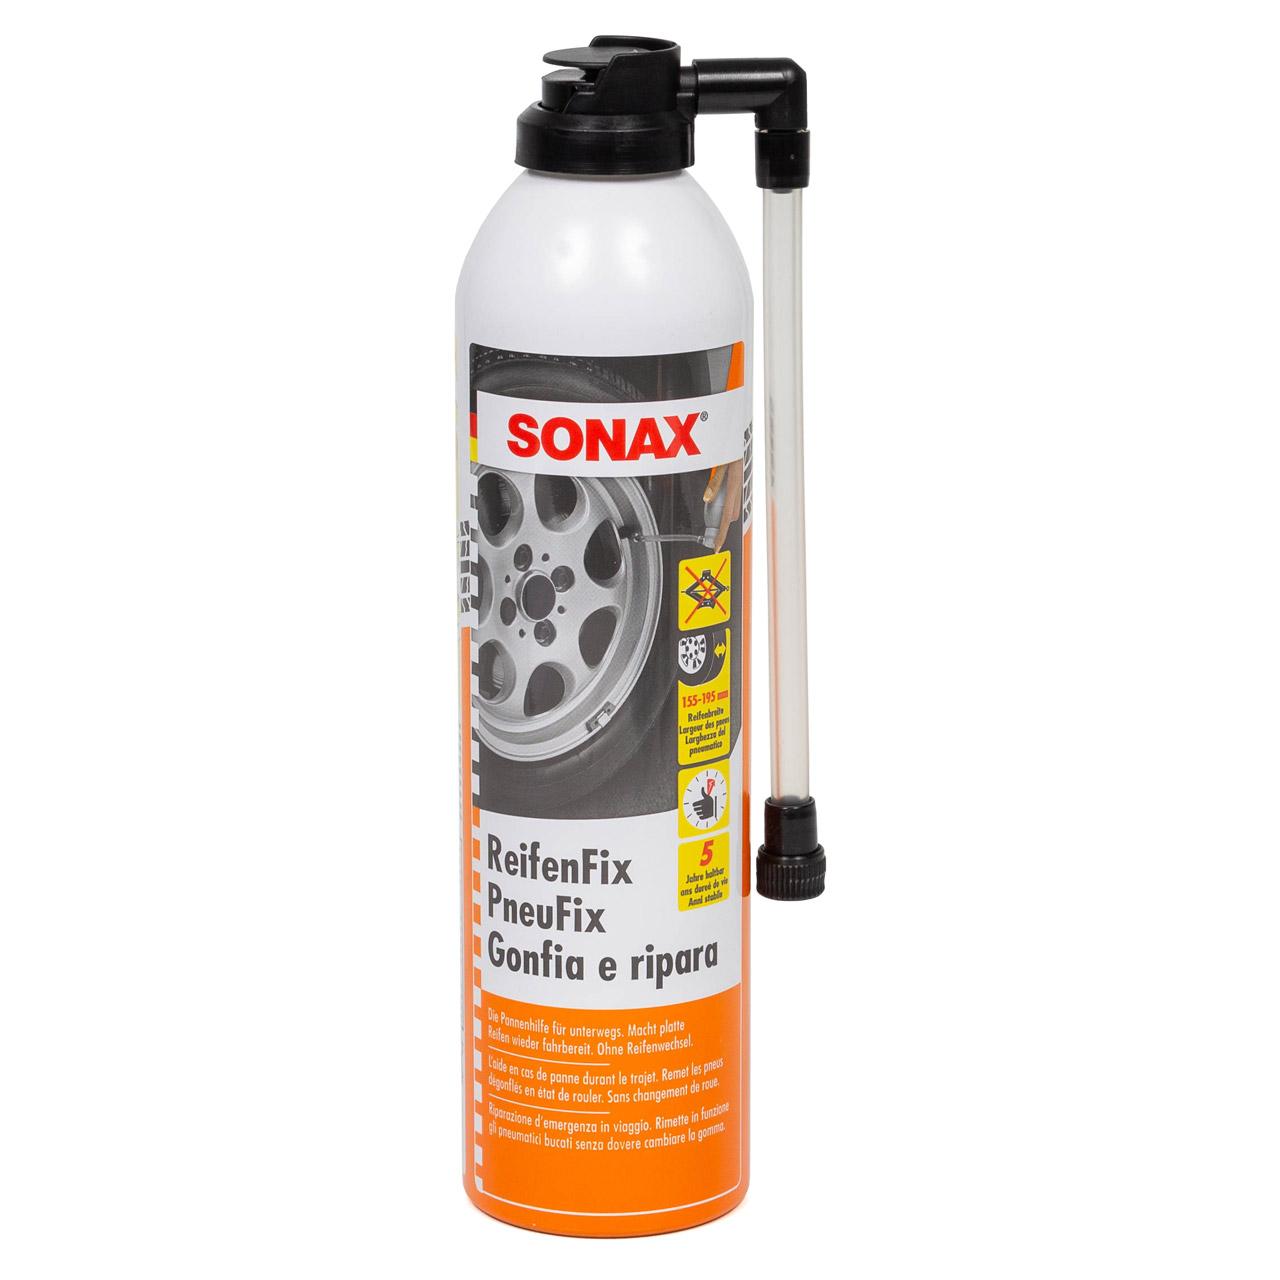 SONAX Auto-Reifenfix Reifen Reparatur Set Pannenhilfe 400ml 432300